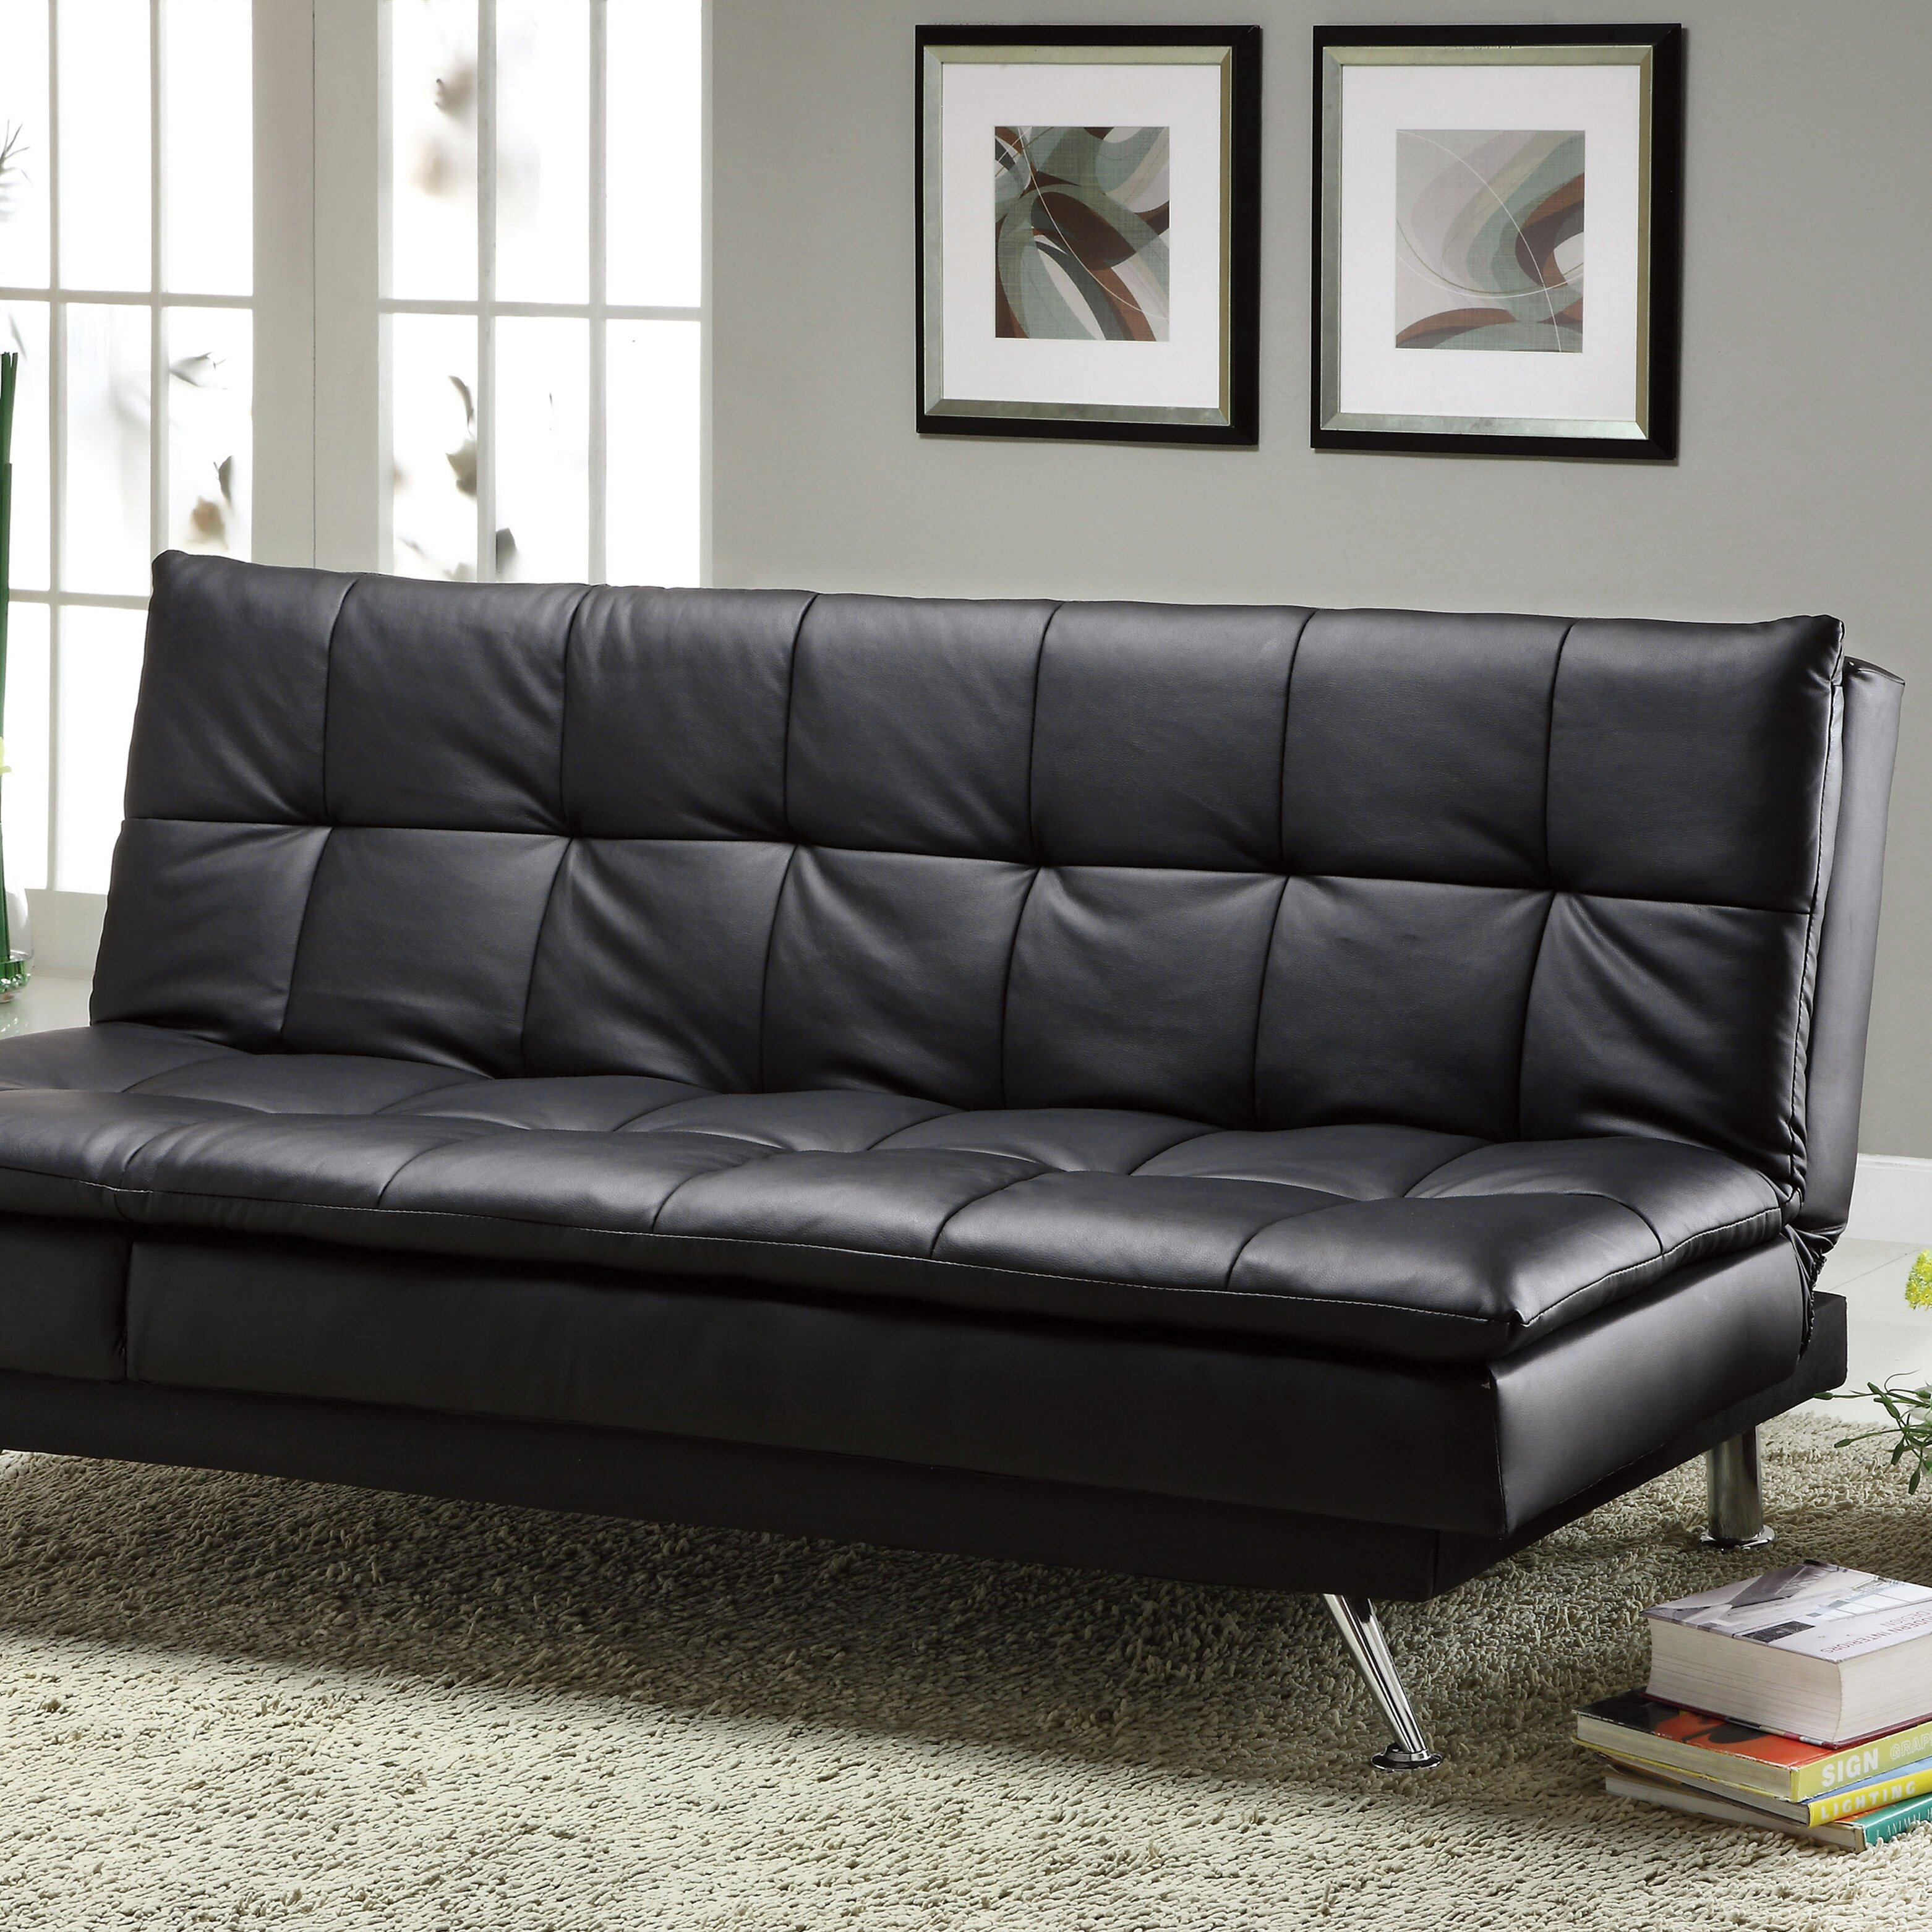 Latitude Run Black Faux Leather Sleeper Sofa Amp Reviews